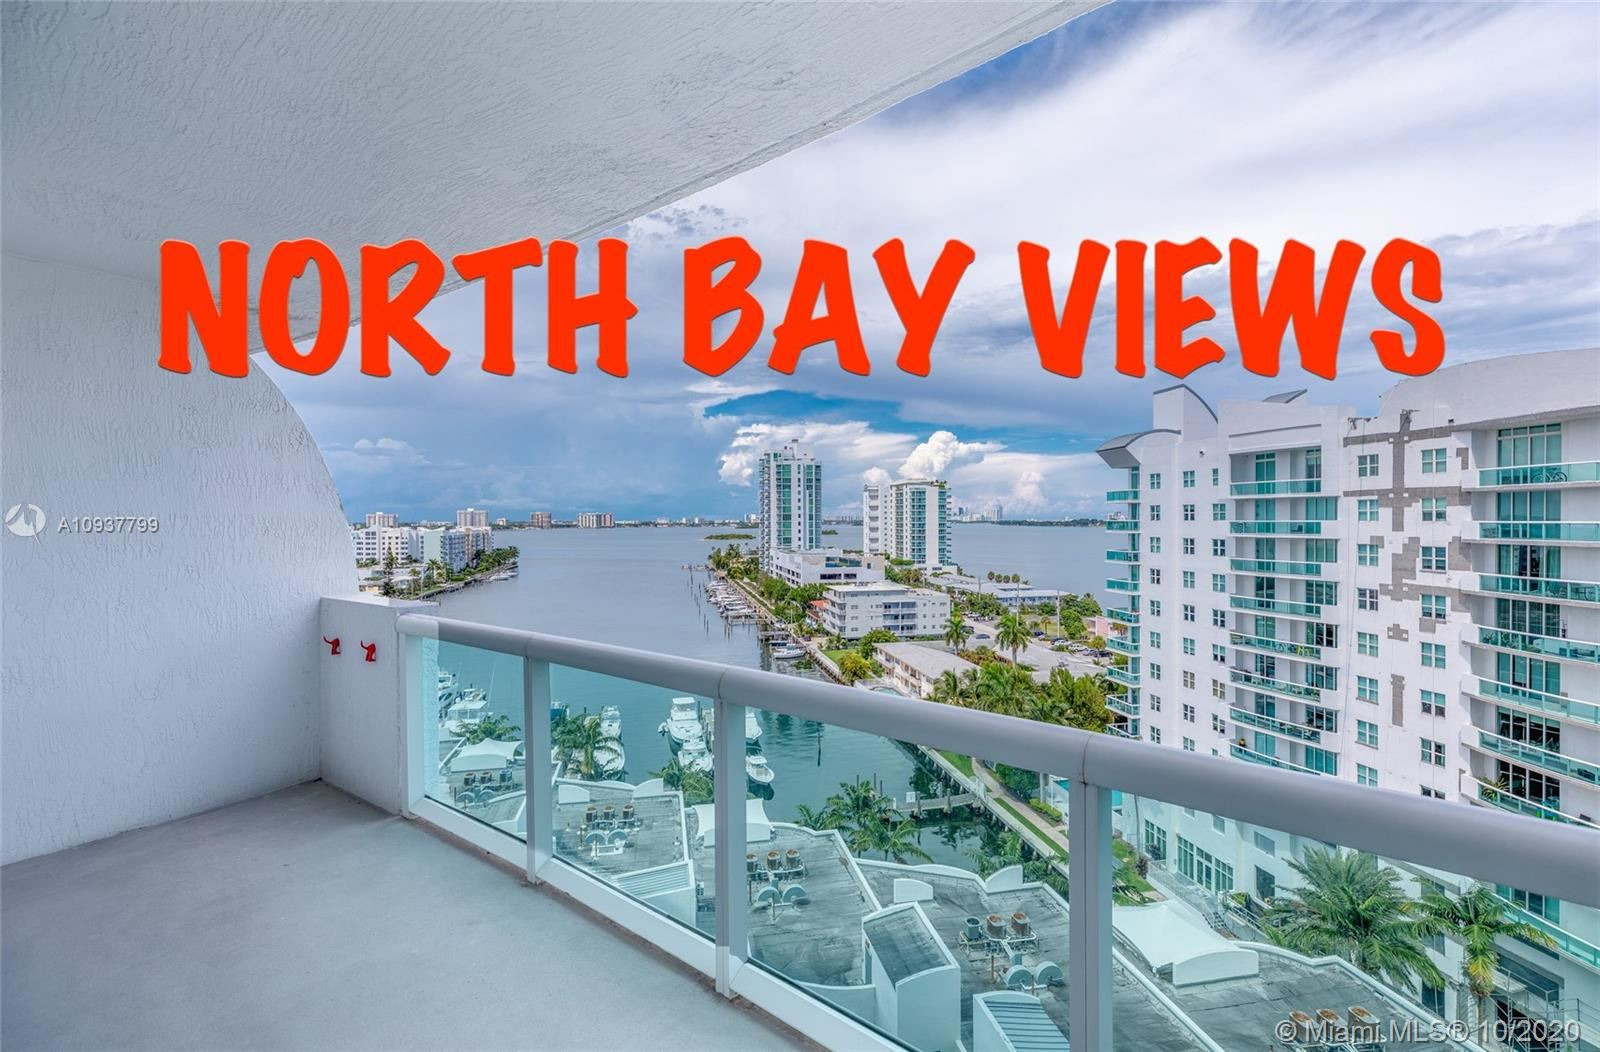 7900 Harbor Island Dr #1105, North Bay Village, FL 33141 - #: A10937799